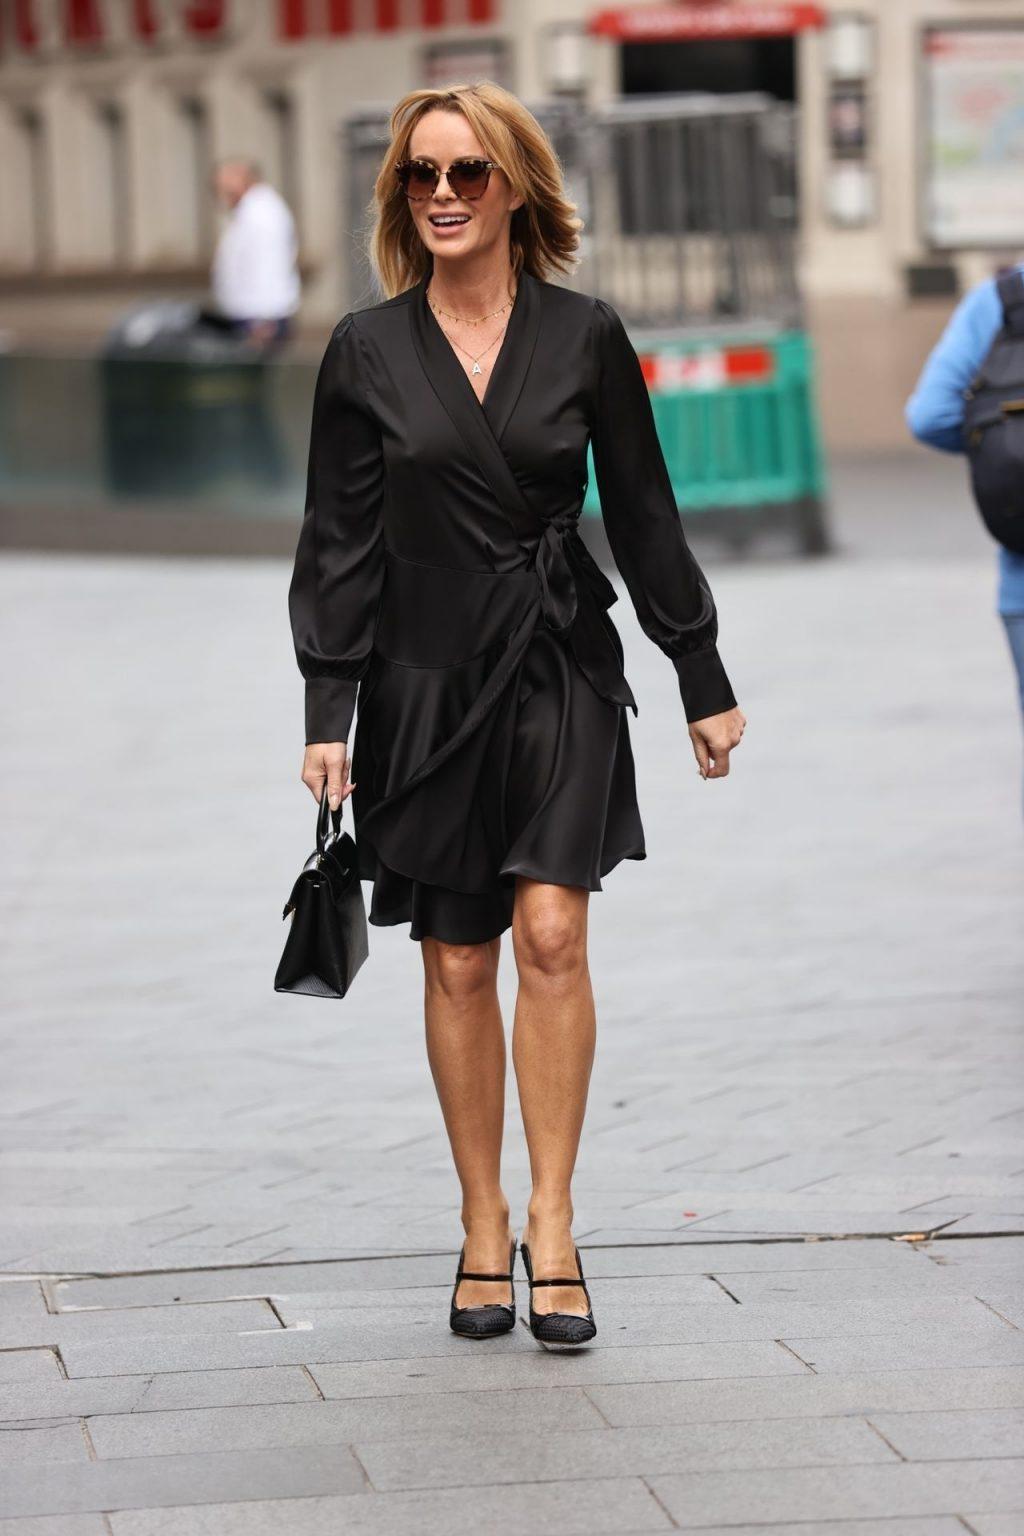 Amanda Holden Wears Black Dress at Heart Radio (53 Photos)